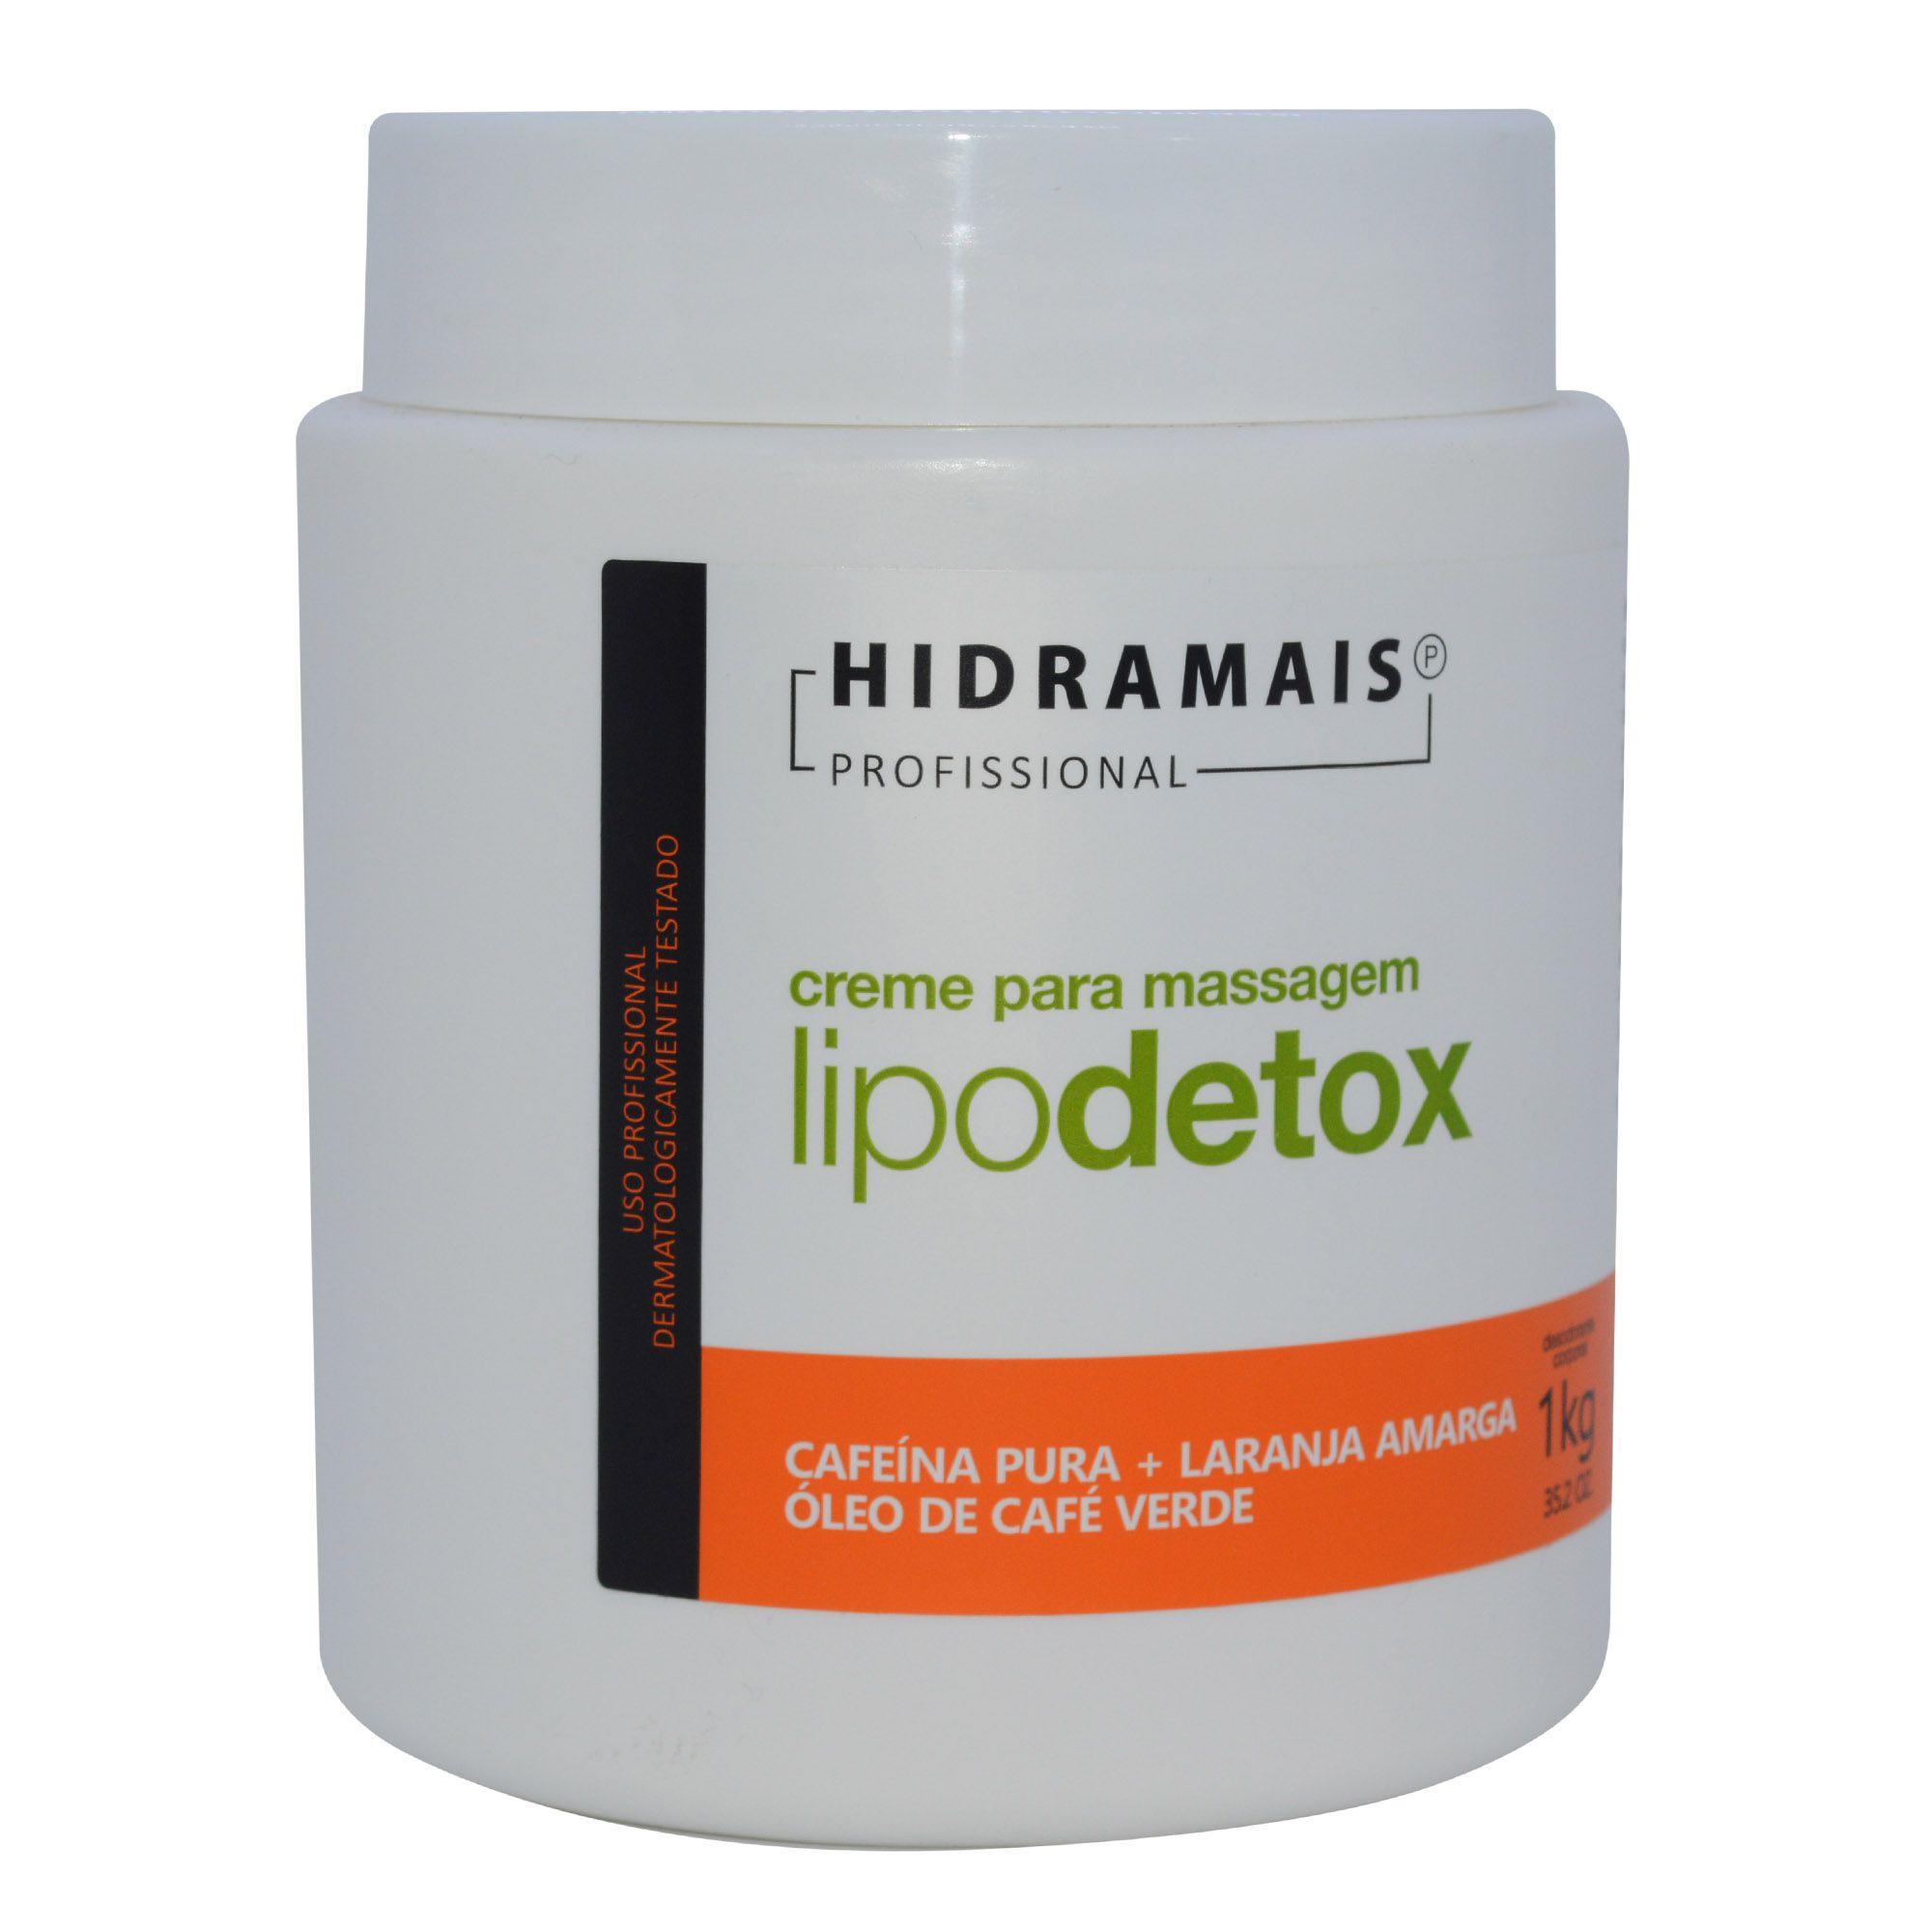 Creme para massagem LipoDetox 1Kg - Hidramais